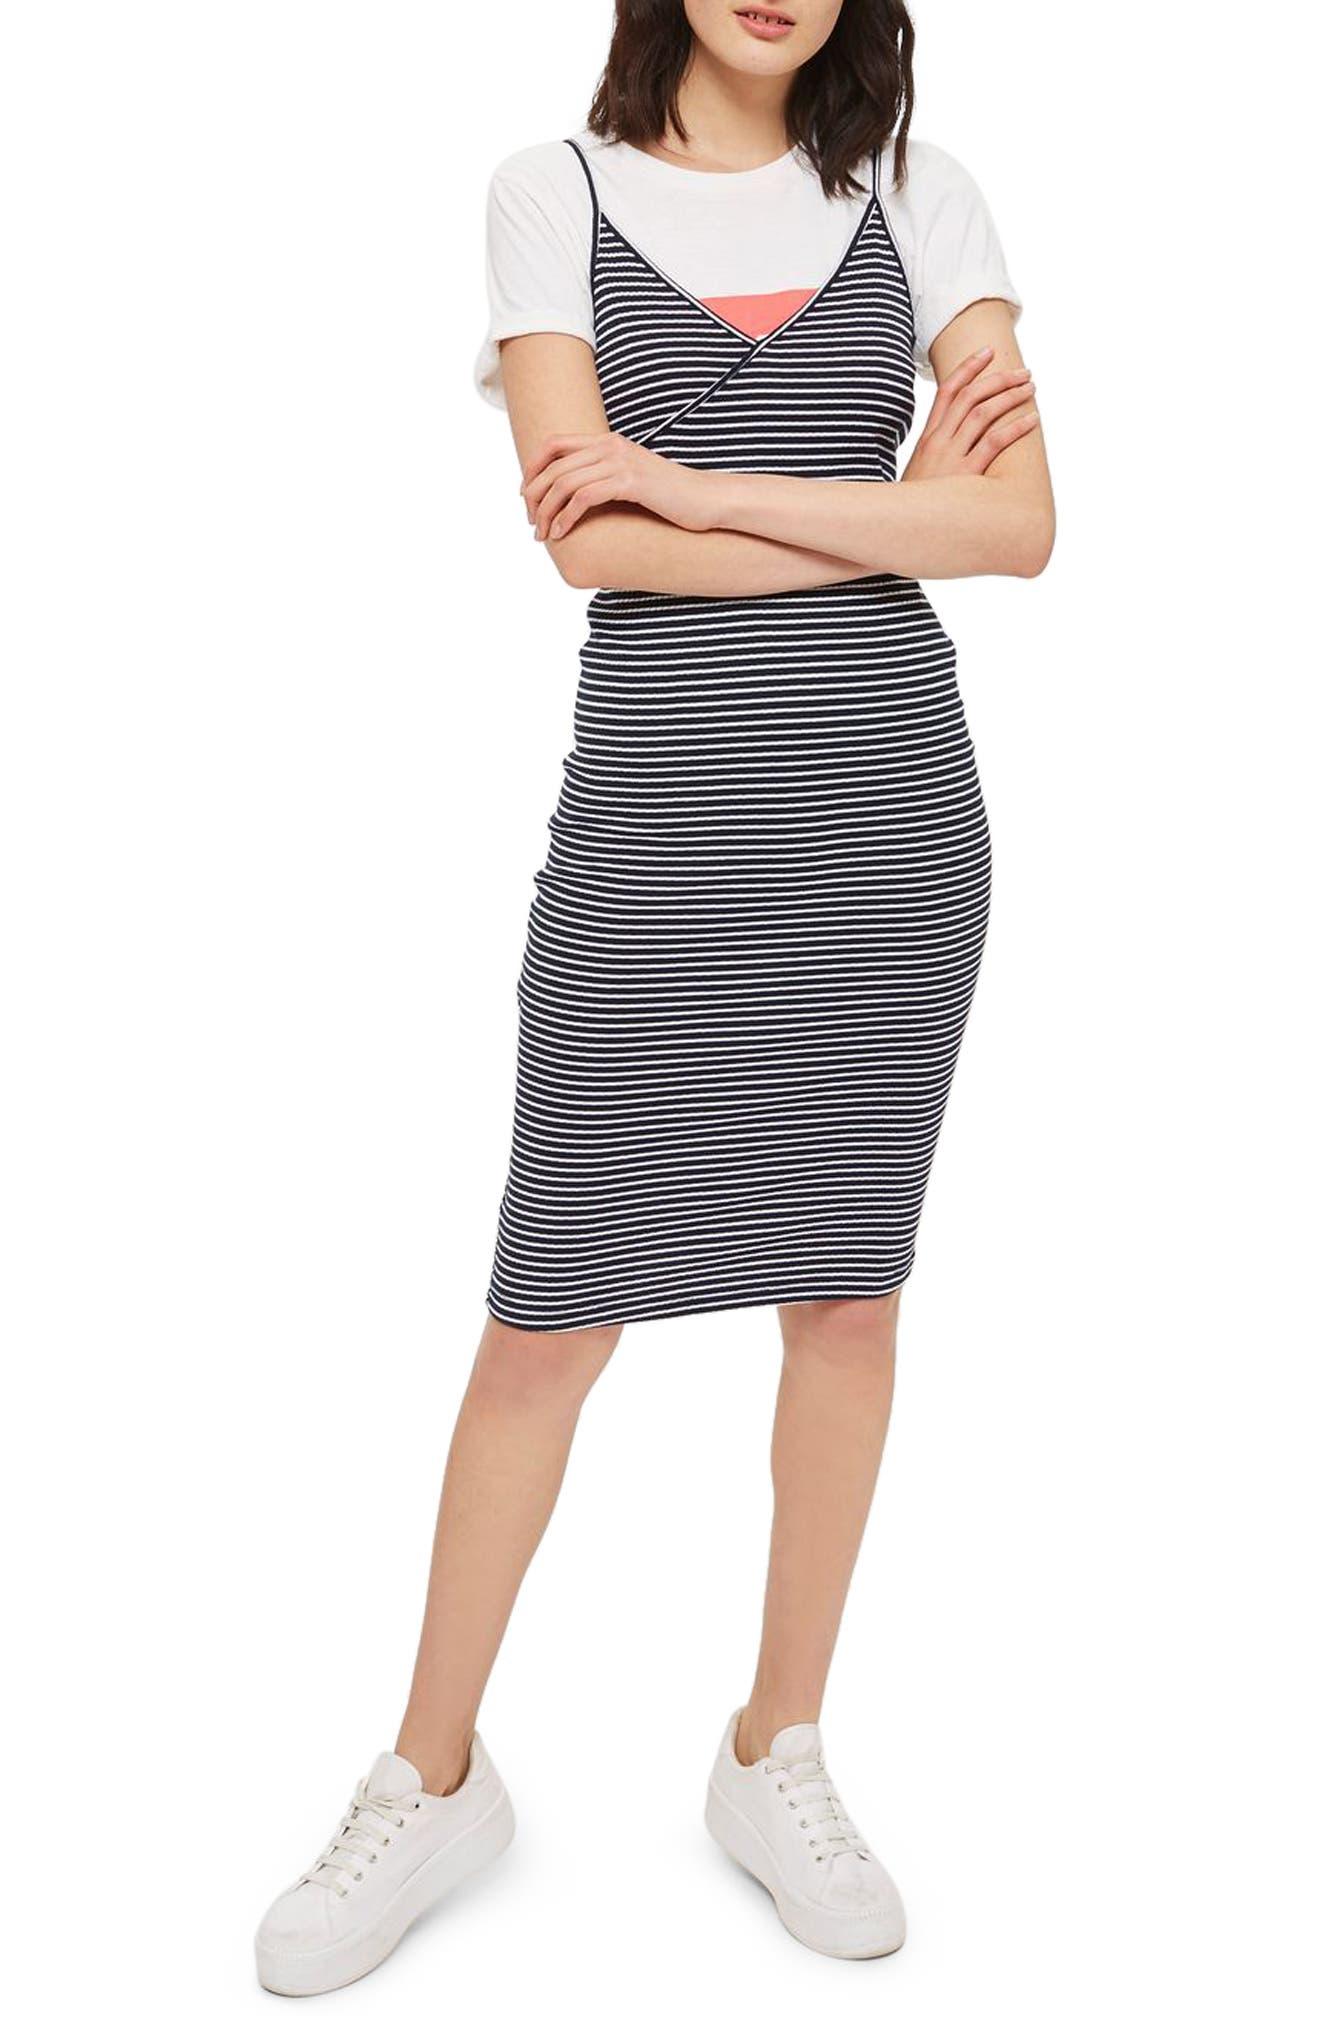 Alternate Image 1 Selected - Topshop Kaia Stripe Tank Dress